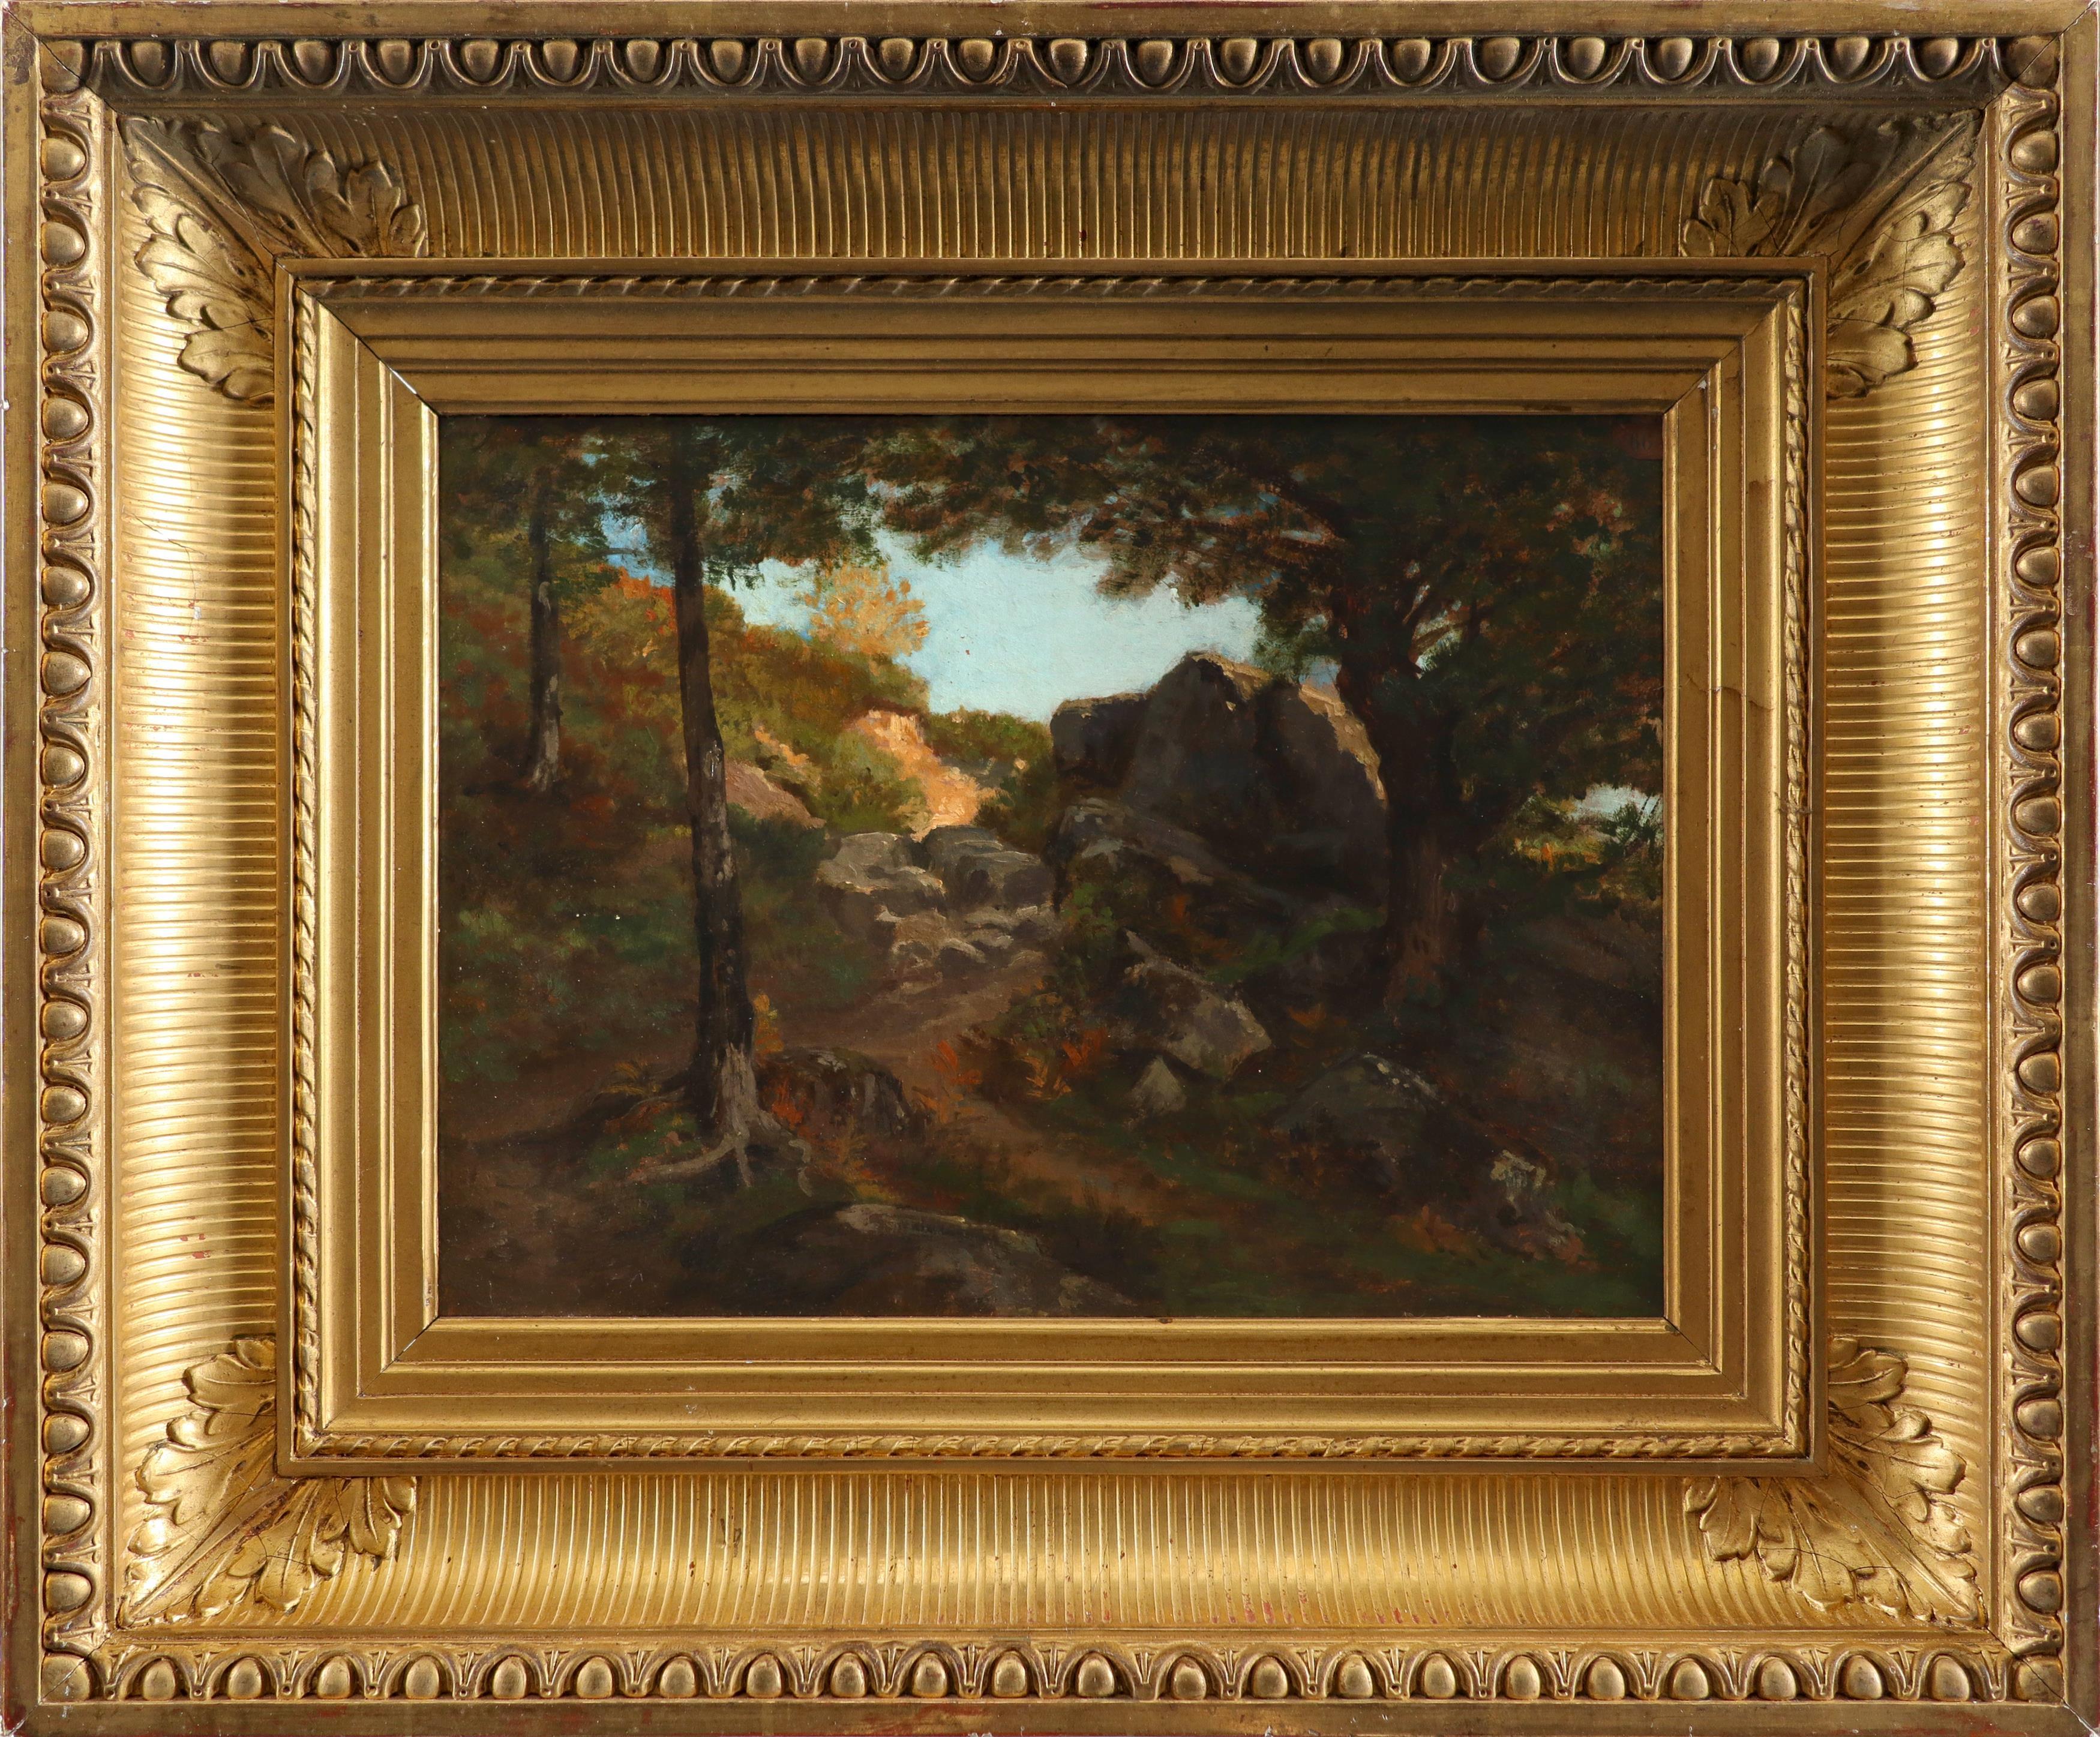 Auguste-Paul-Charles Anastasi (French 1820-1889) Sentier dans les Rochers à Pont-Aven, Bretagne - Image 2 of 3